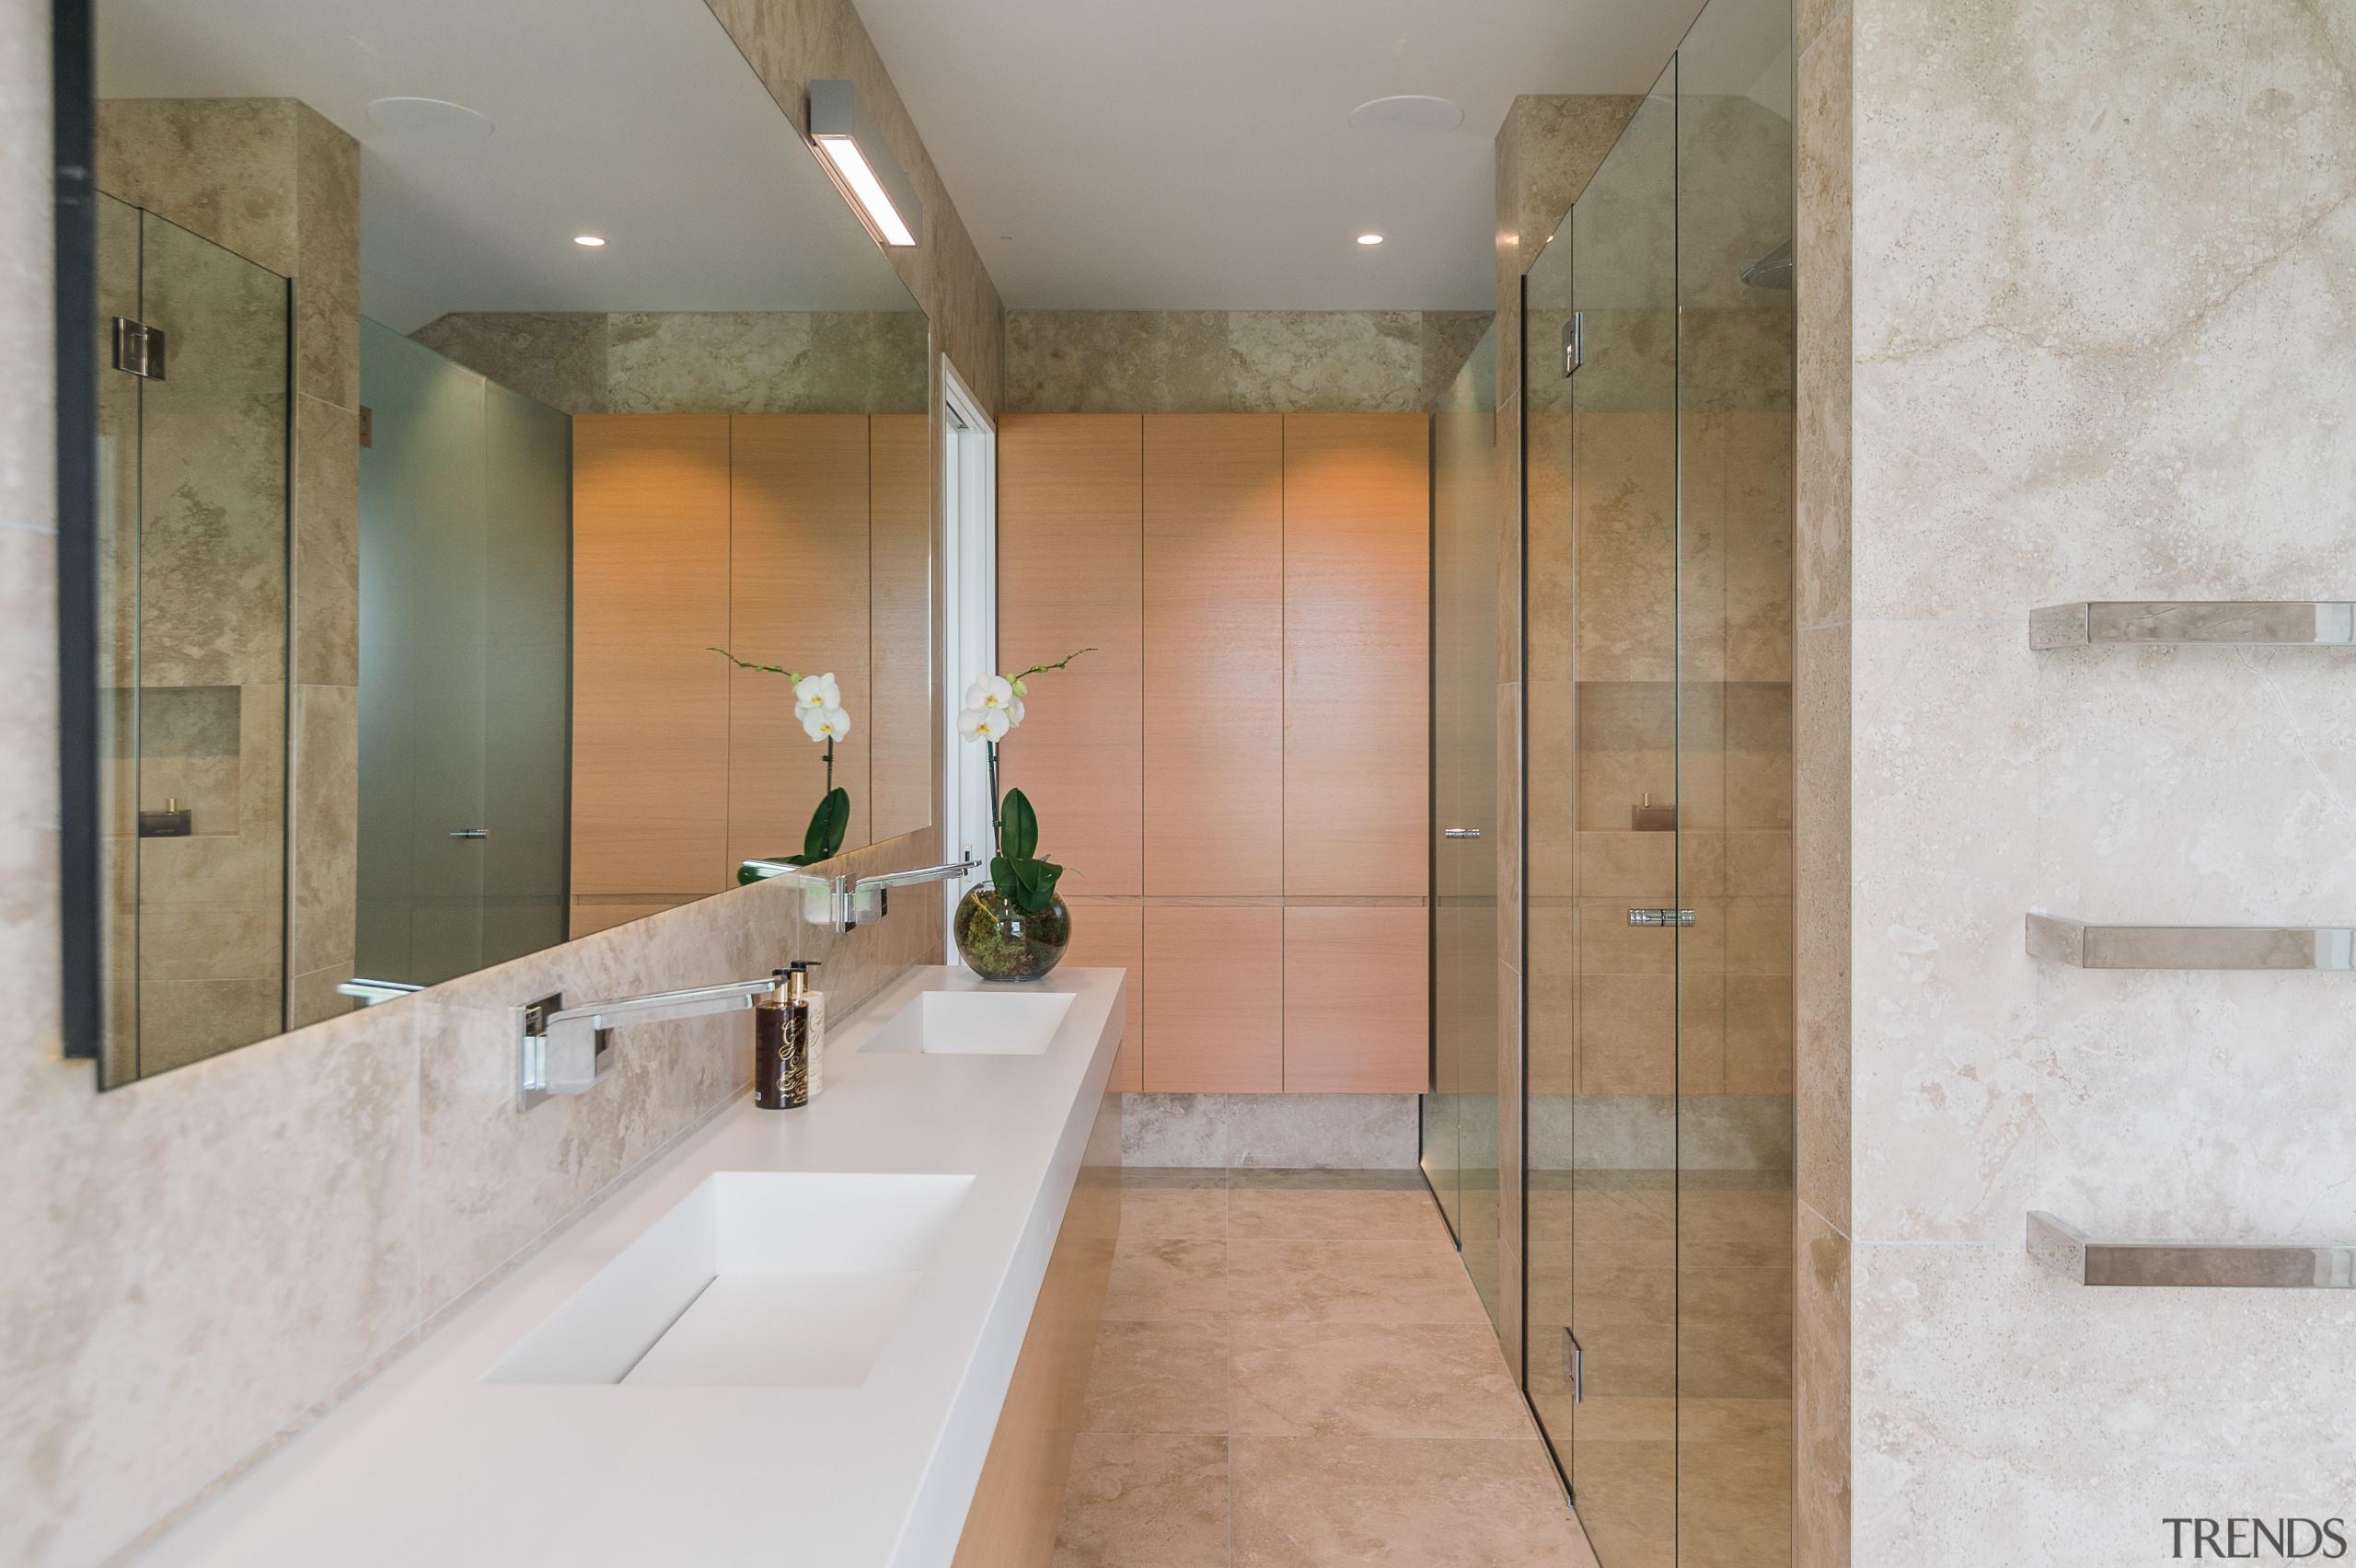 This long, narrow bathroom has the toilet at architecture, bathroom, floor, interior design, room, tile, gray